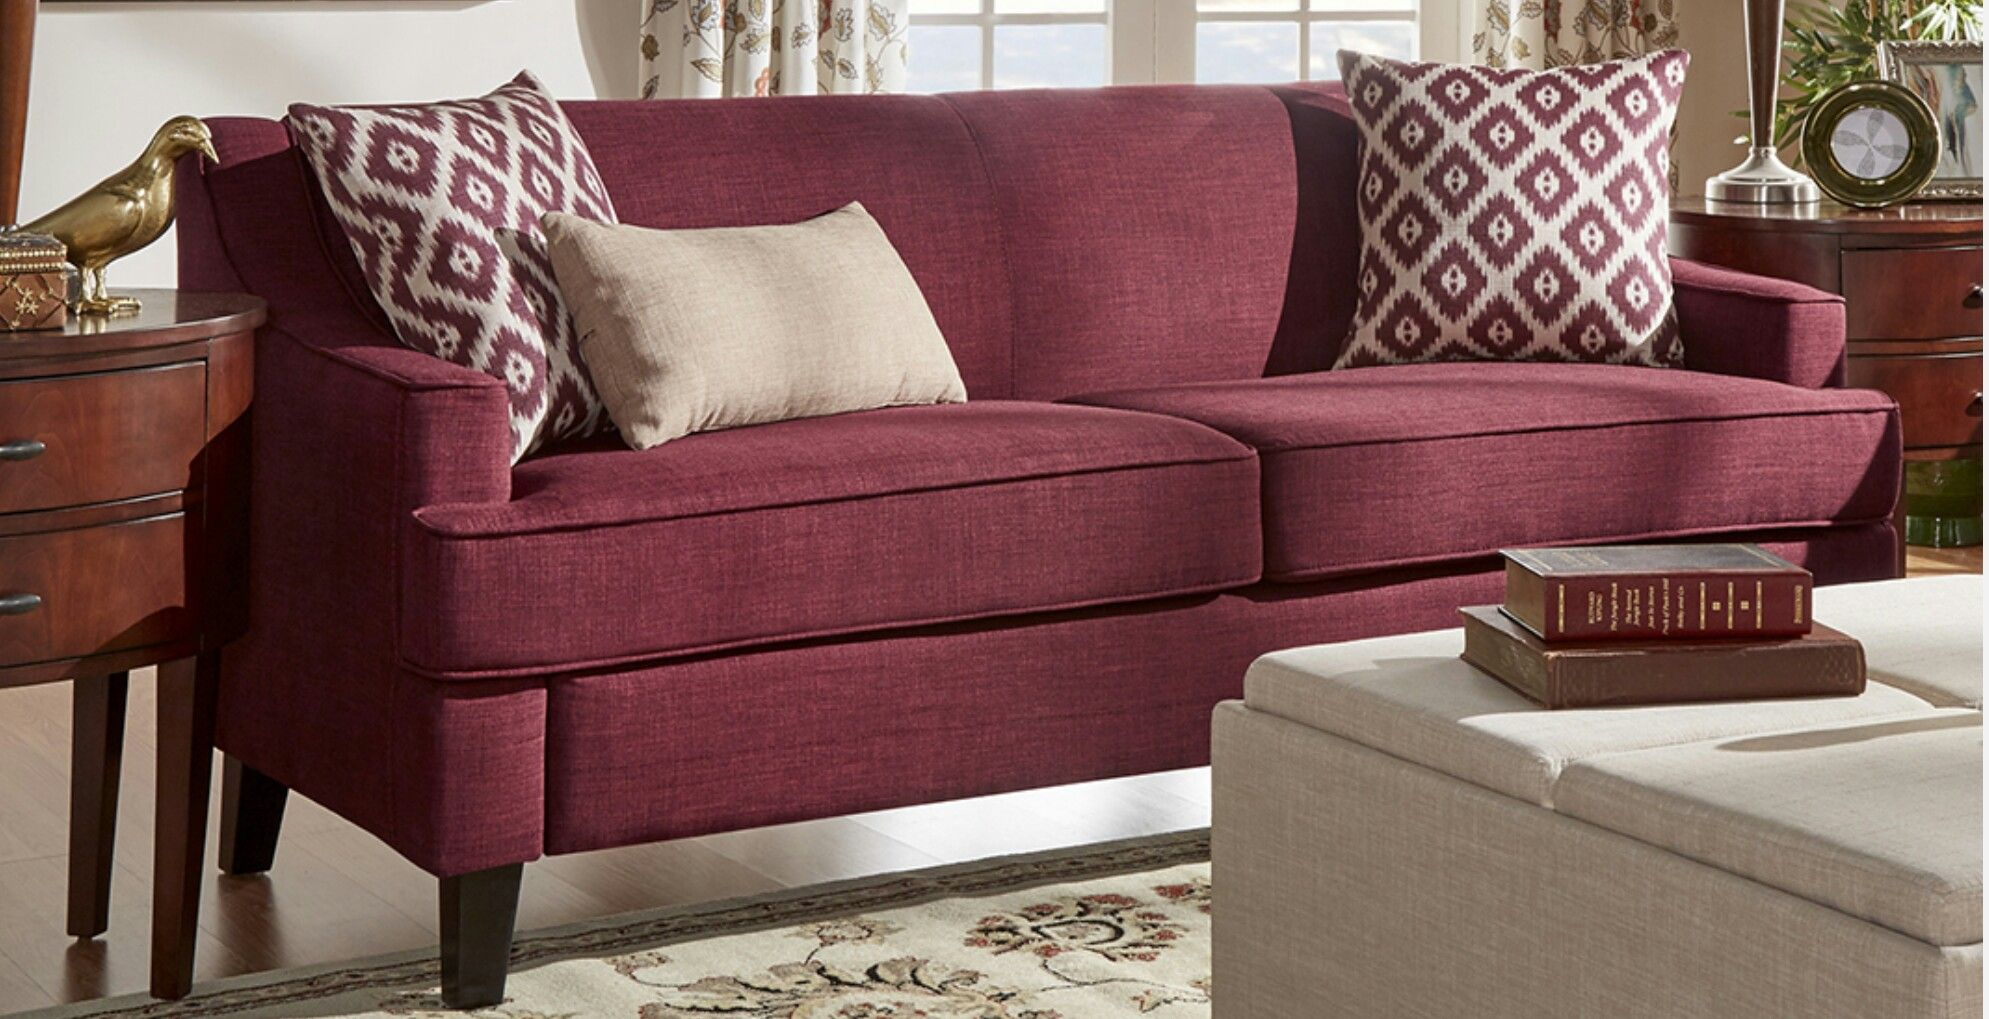 burgundy sofa and loveseat best leather deals uk apartment ideas pinterest